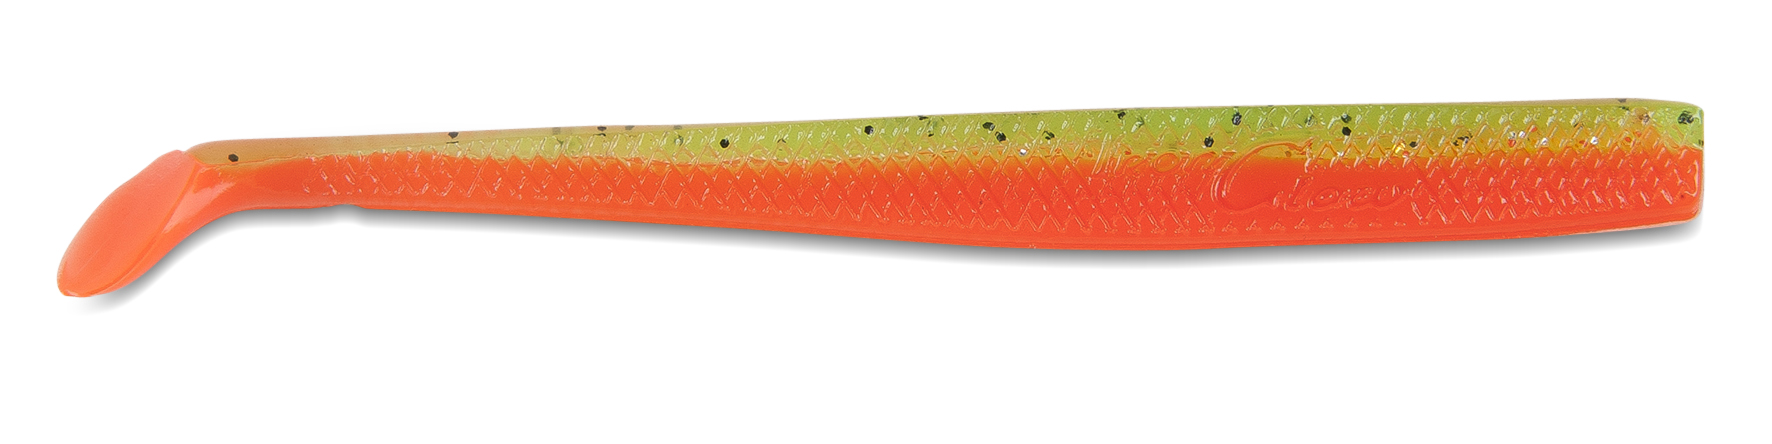 Iron Claw gumová nástraha Skinny Jake 14cm Vzor OB, 3ks